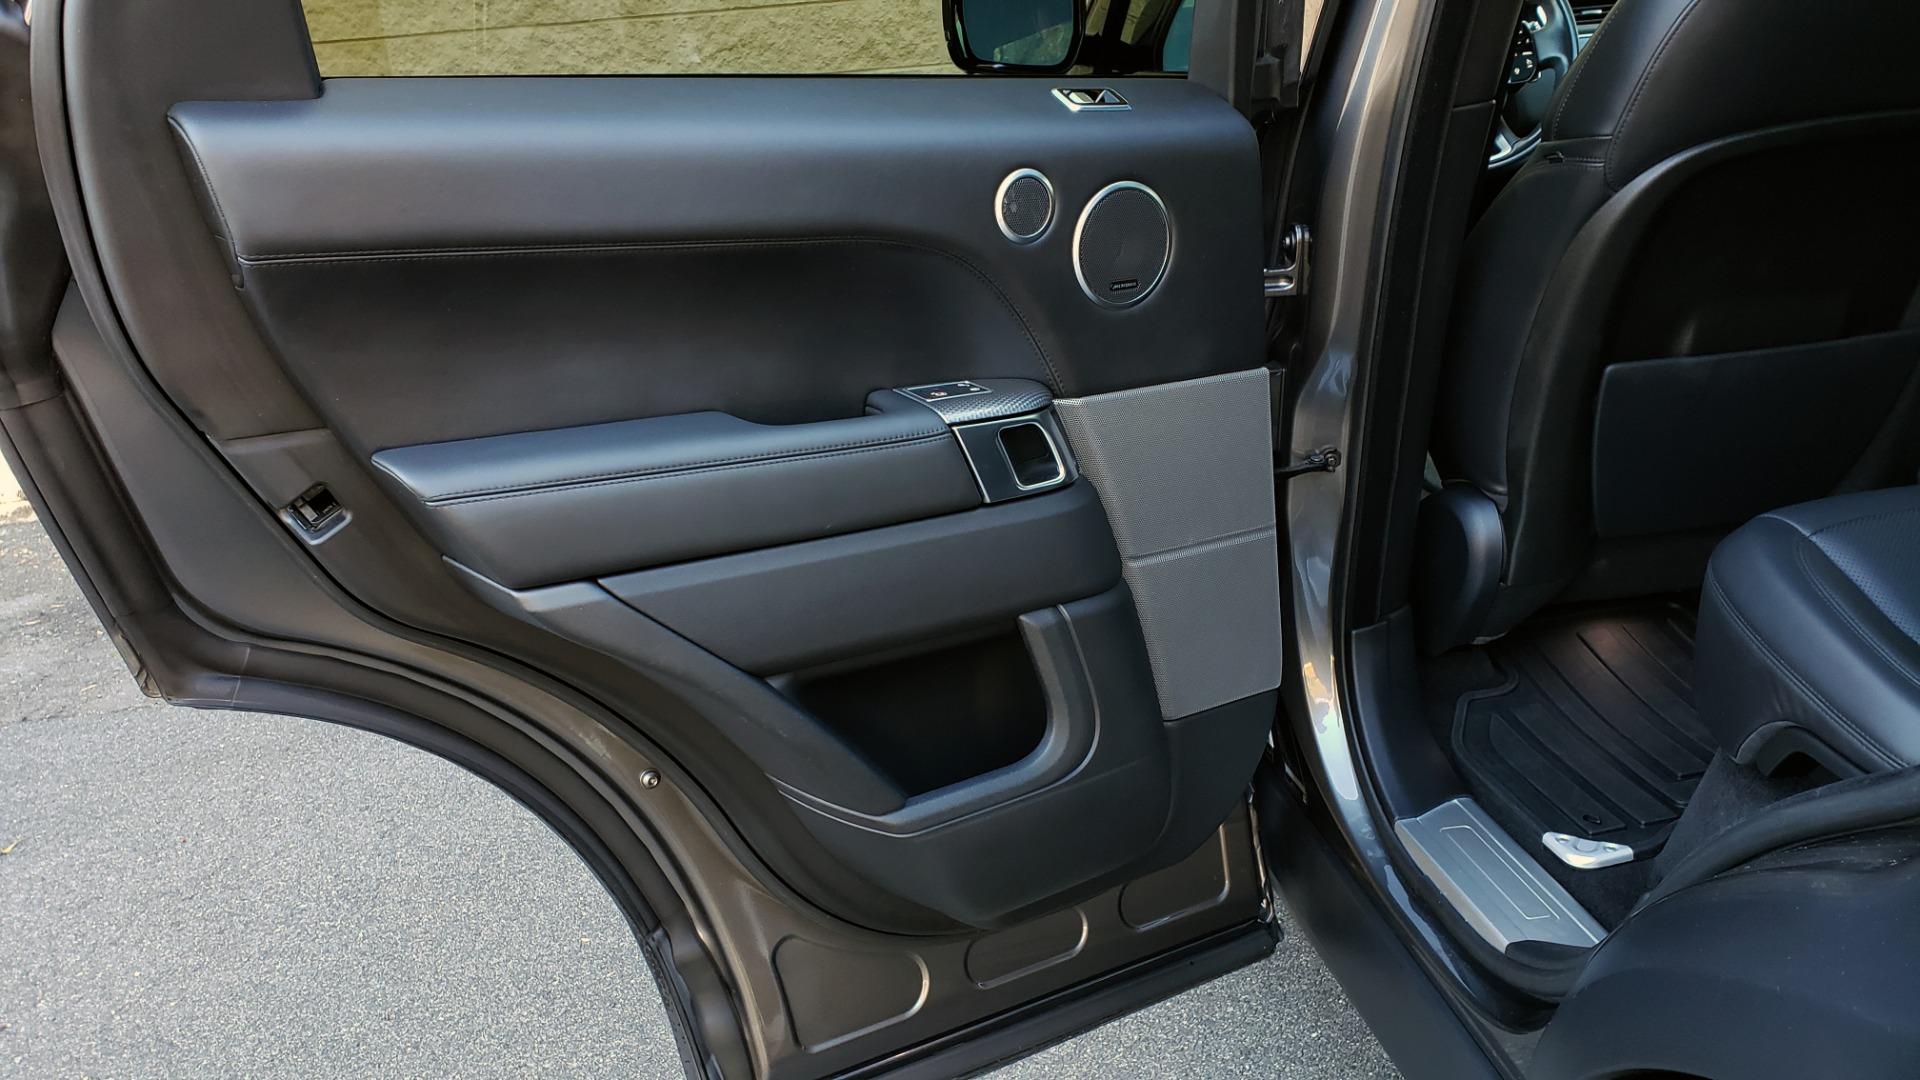 Used 2018 Land Rover RANGE ROVER SPORT DYNAMIC SC V8 / CLIMATE CMFRT / VISION ASST / MERIDIAN for sale Sold at Formula Imports in Charlotte NC 28227 69